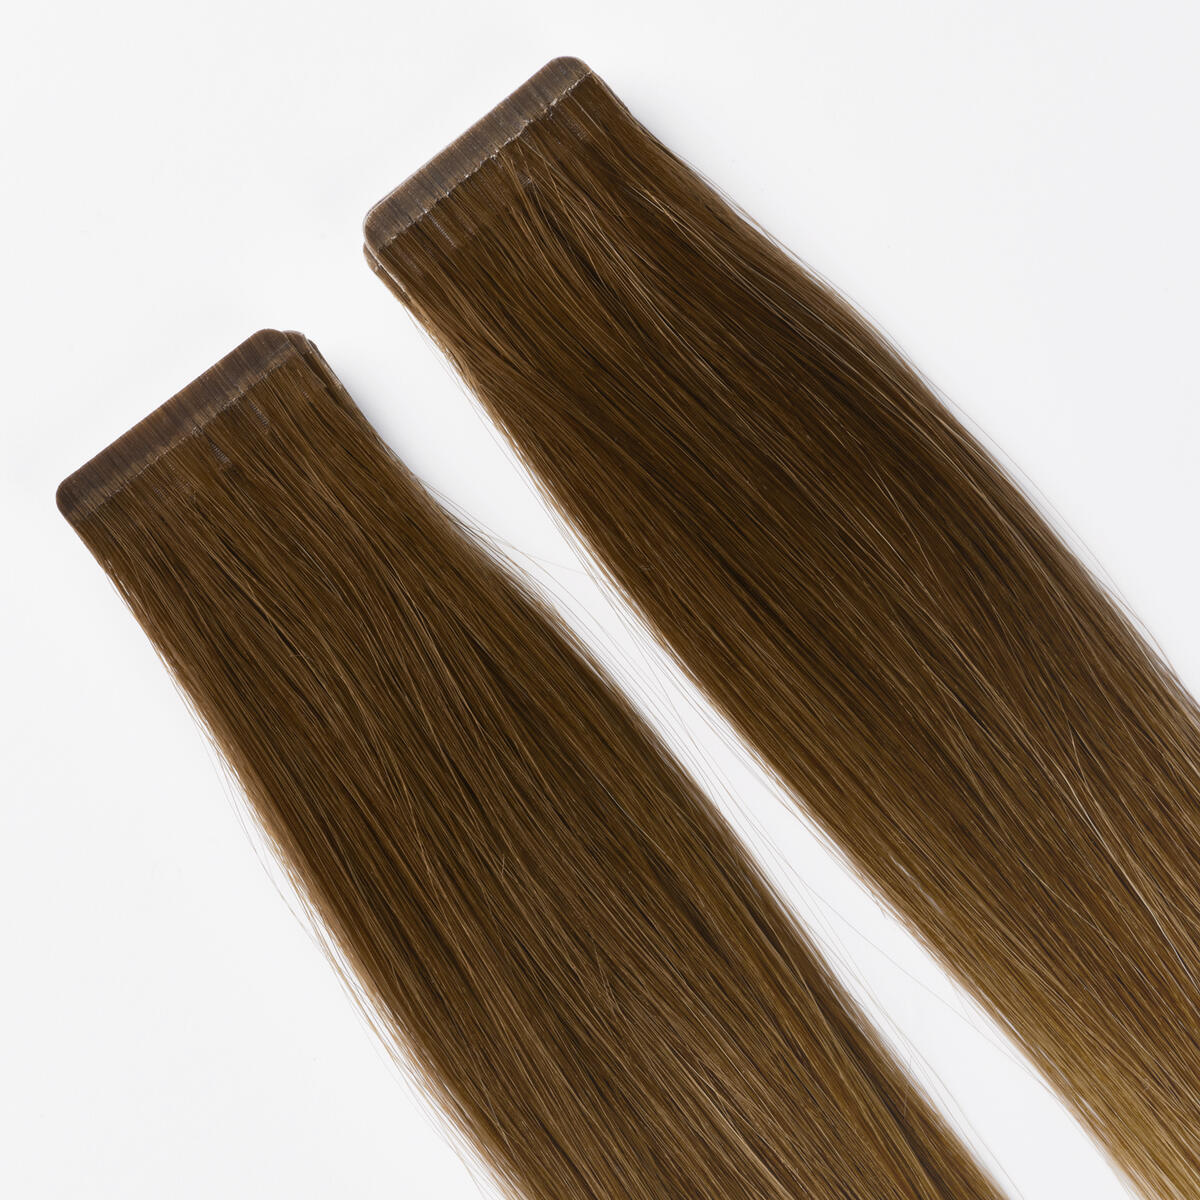 Sleek Tape Extension B5.4/7.2 Cinnamon Blonde Balayage 50 cm